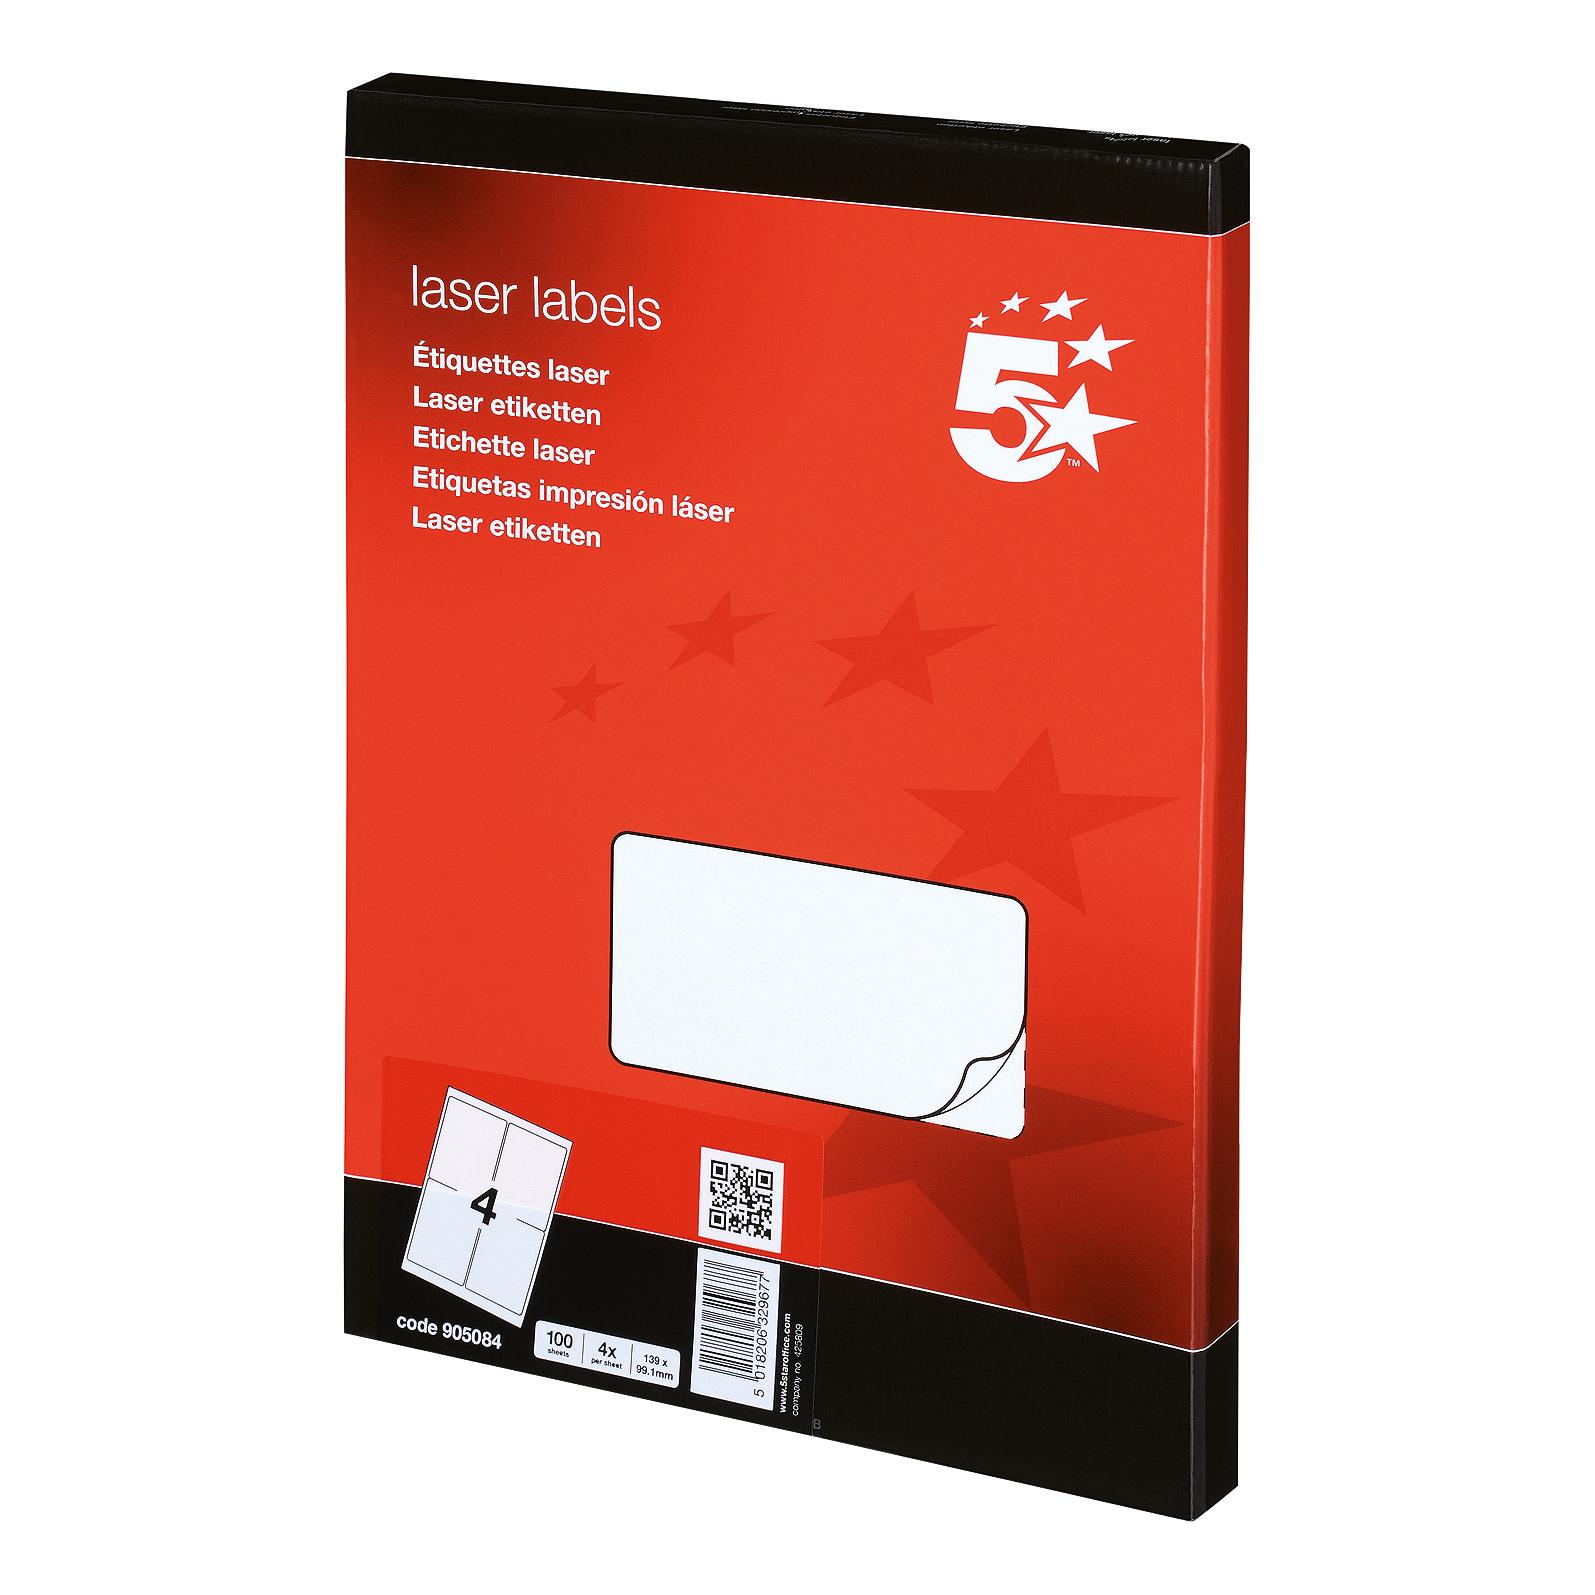 5 star office multipurpose labels laser copier and inkjet 4 per